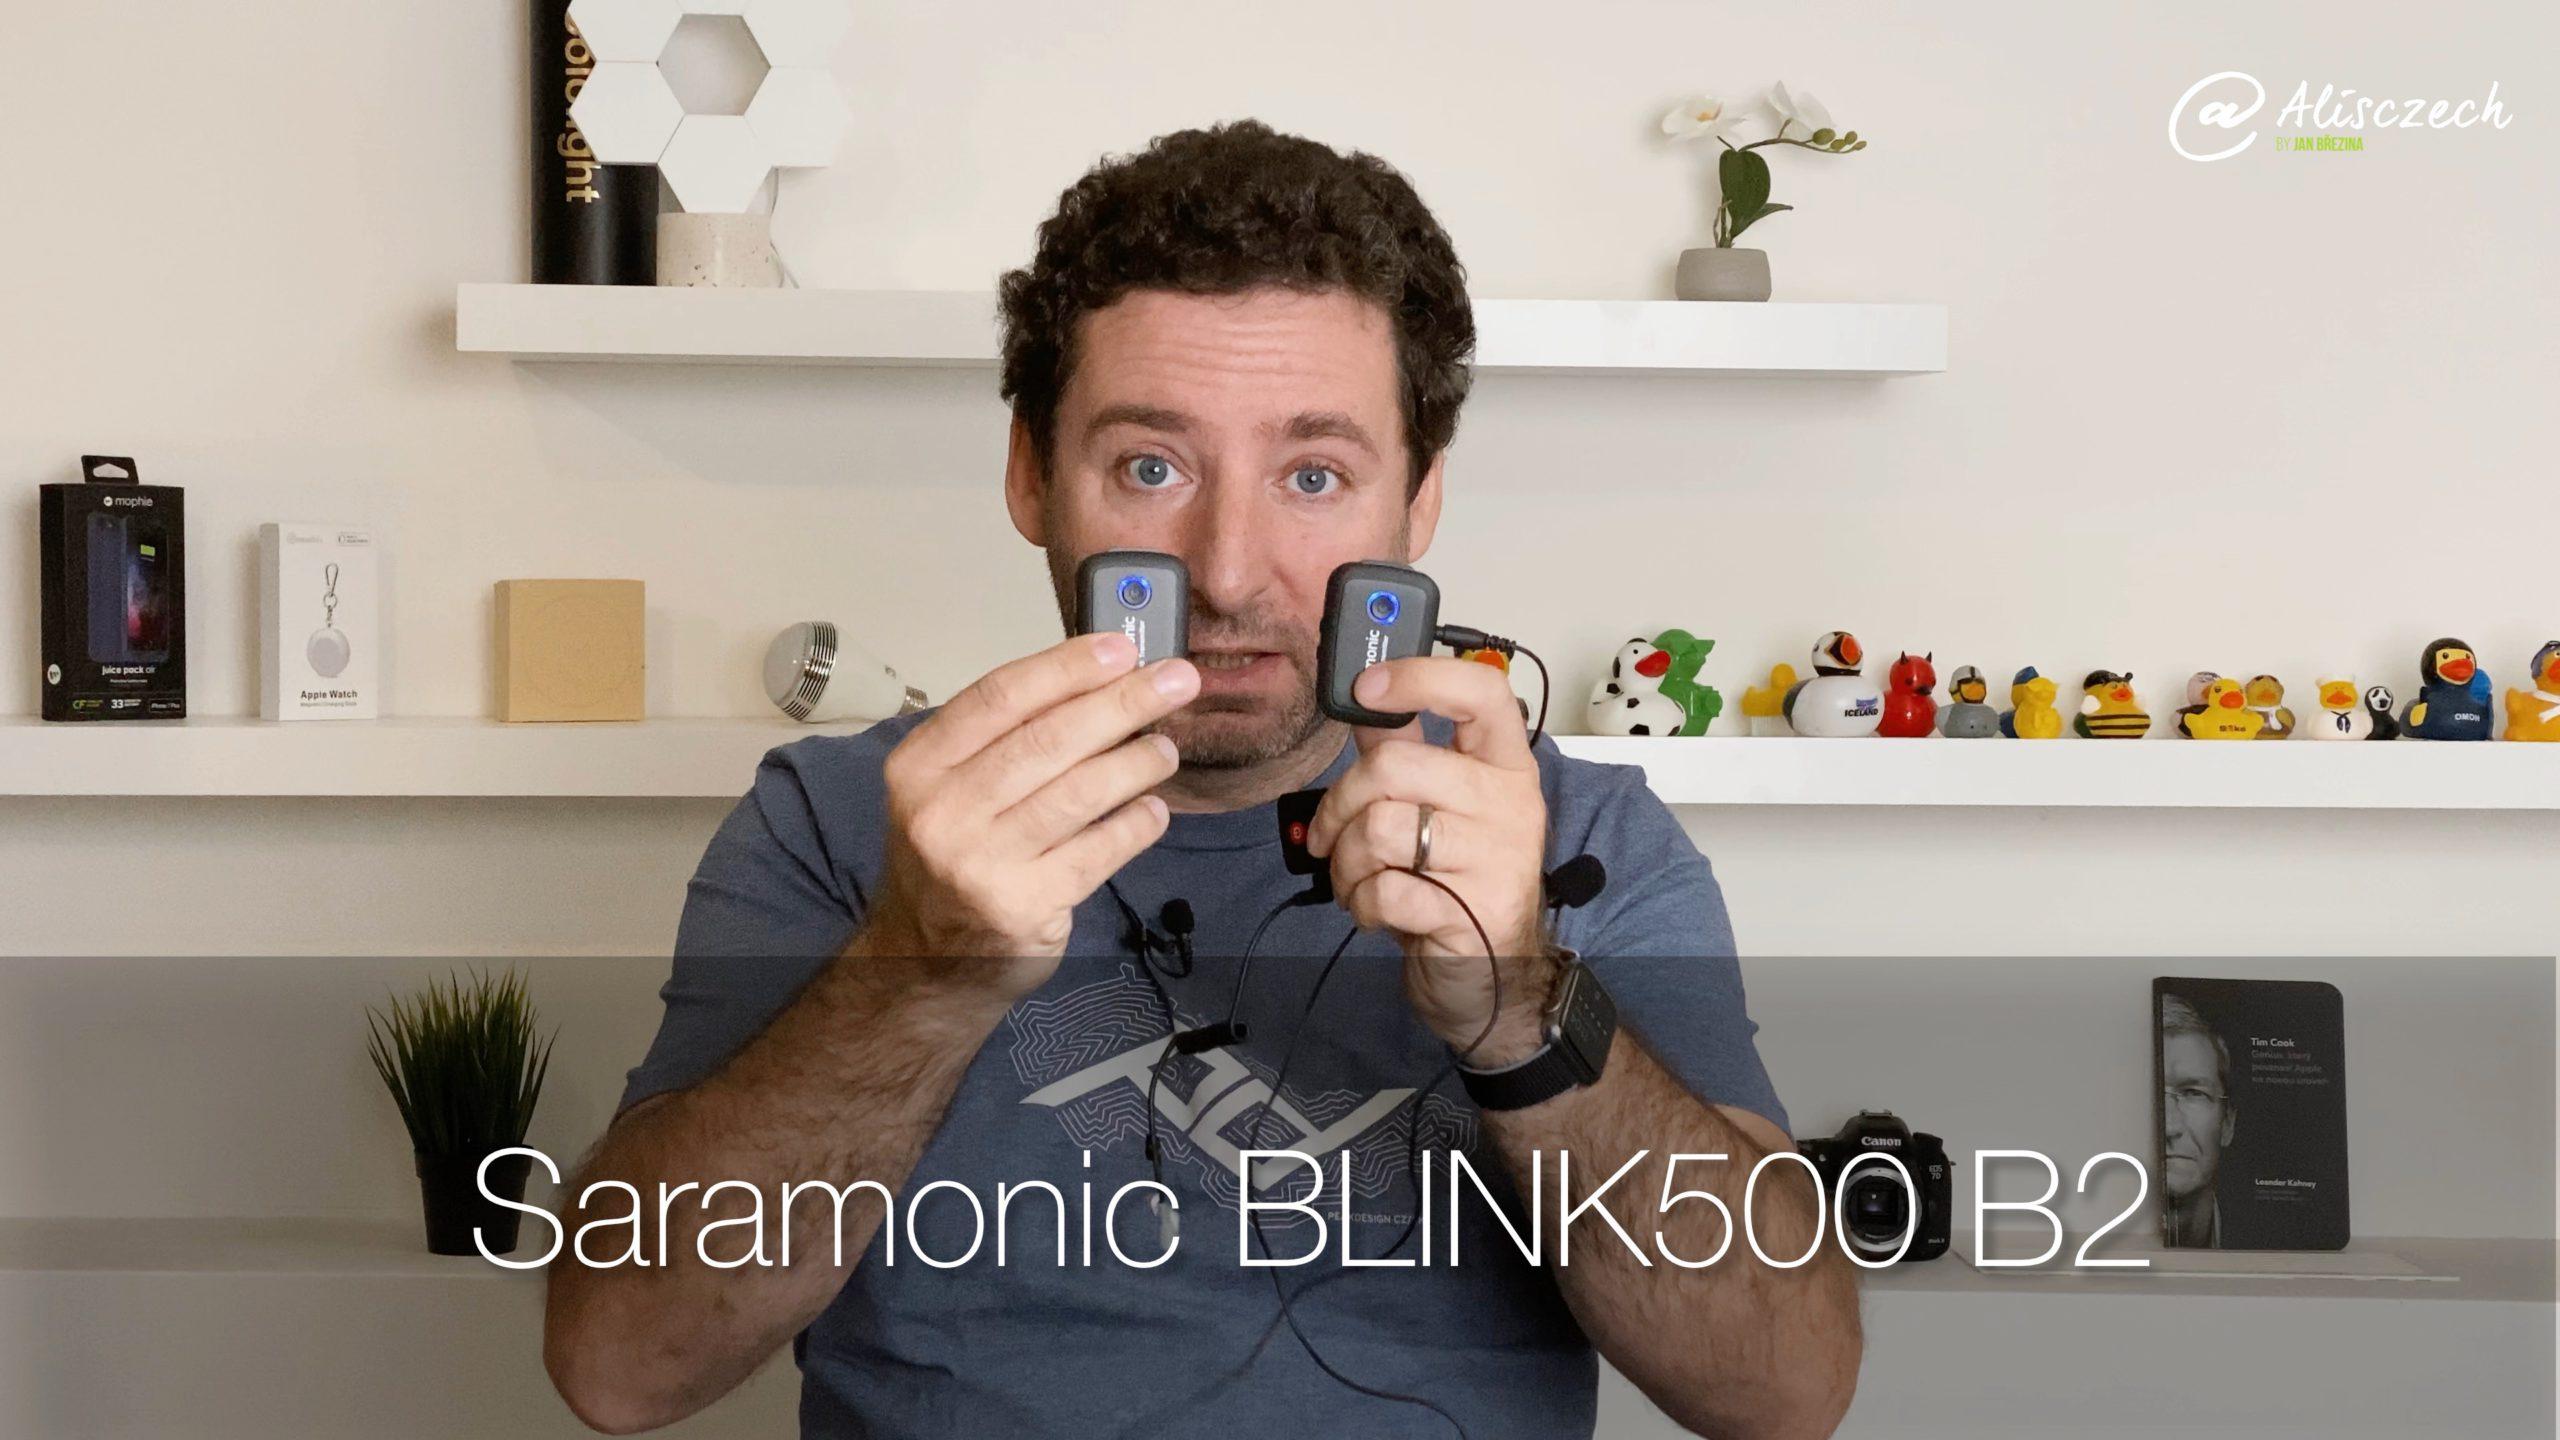 Saramonic BLINK500 B2